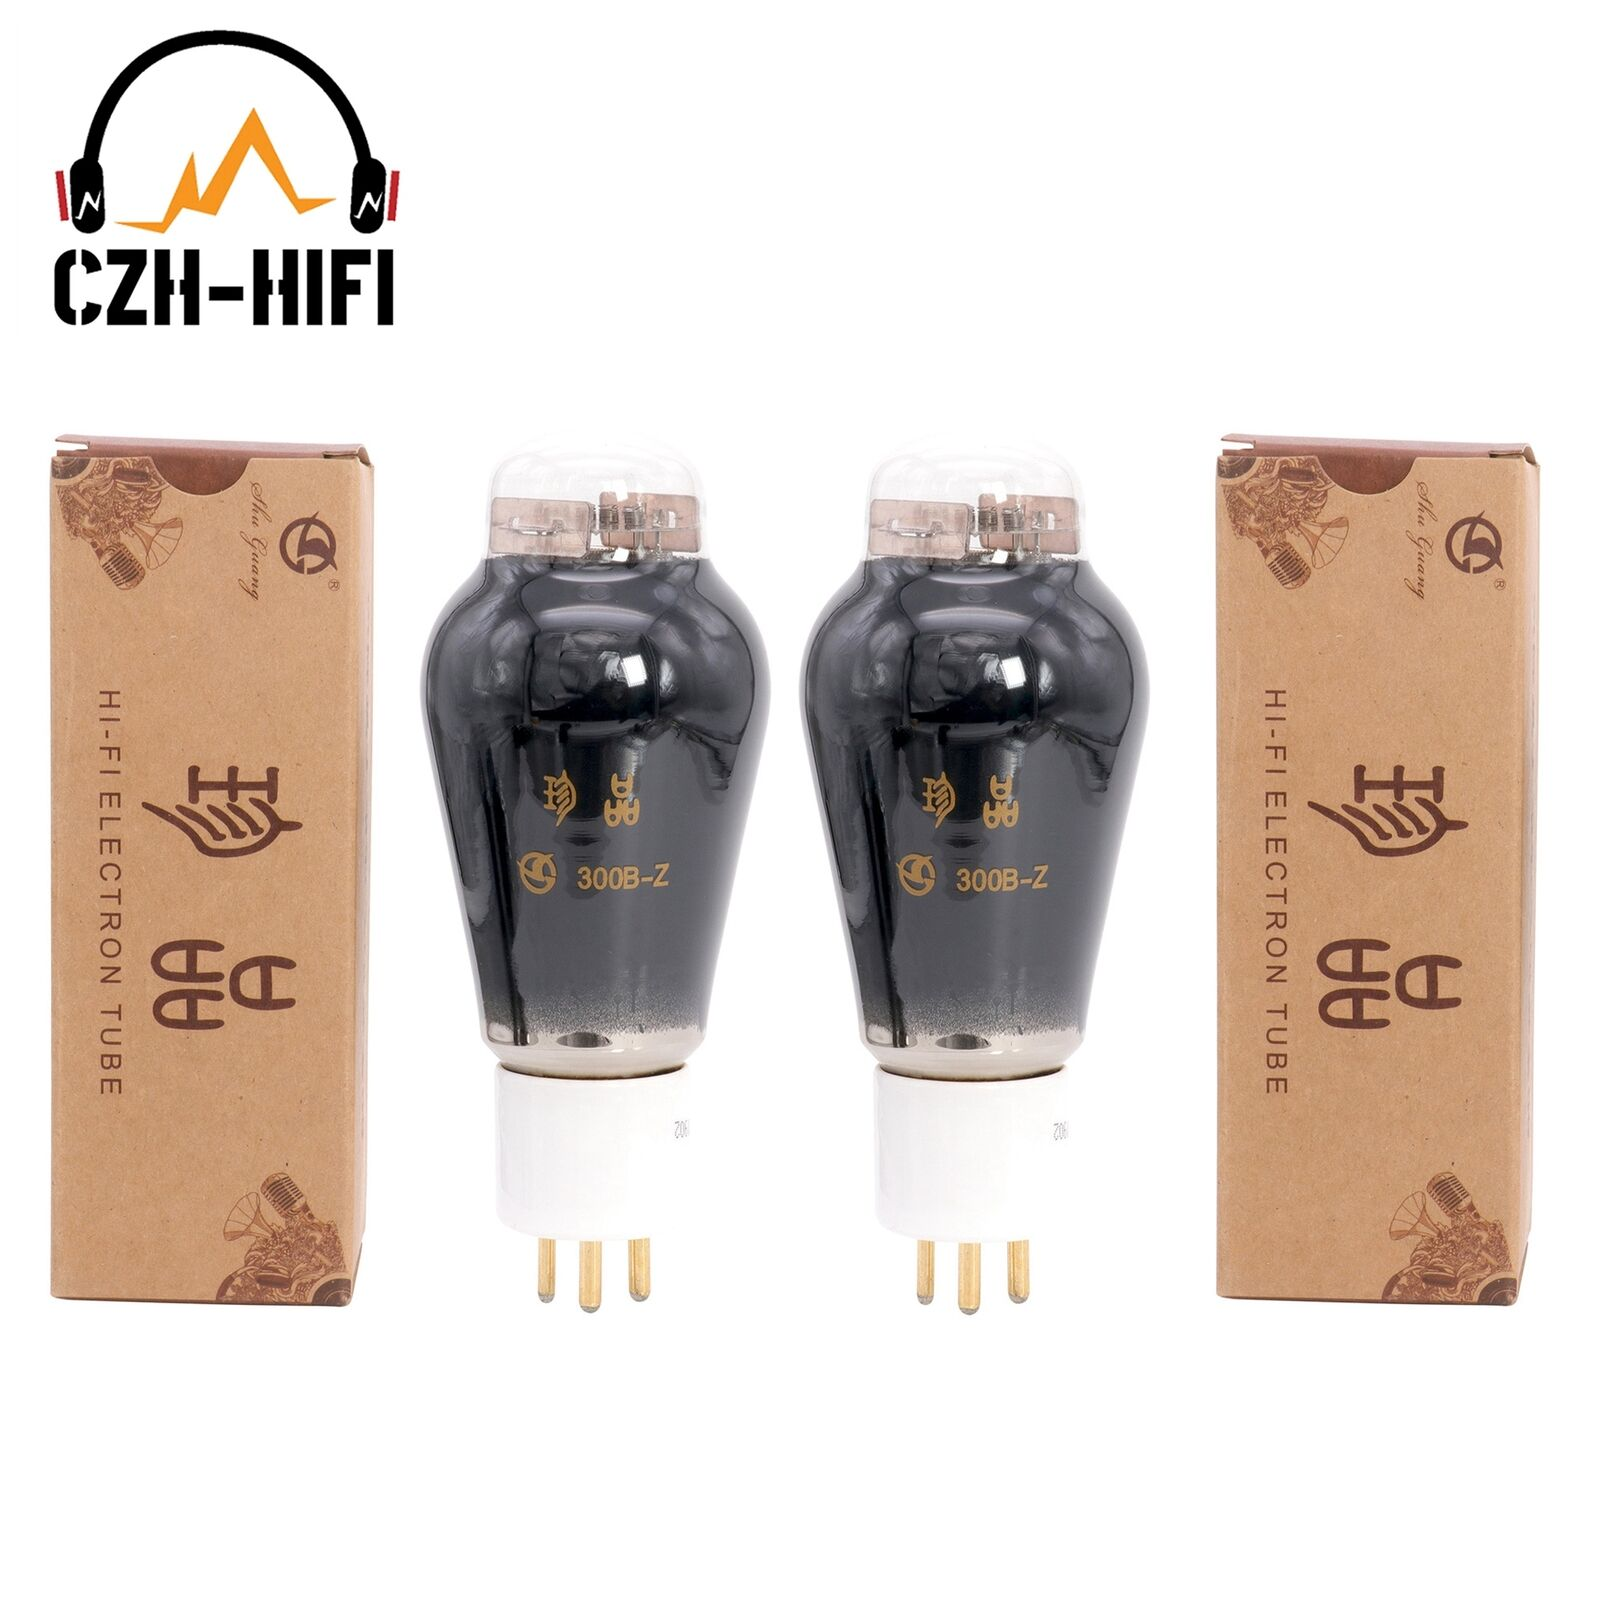 2 PCs Brand NEW 1 Matched pair Shuguang Treasure 300B-Z Audio Valve tubes 300B